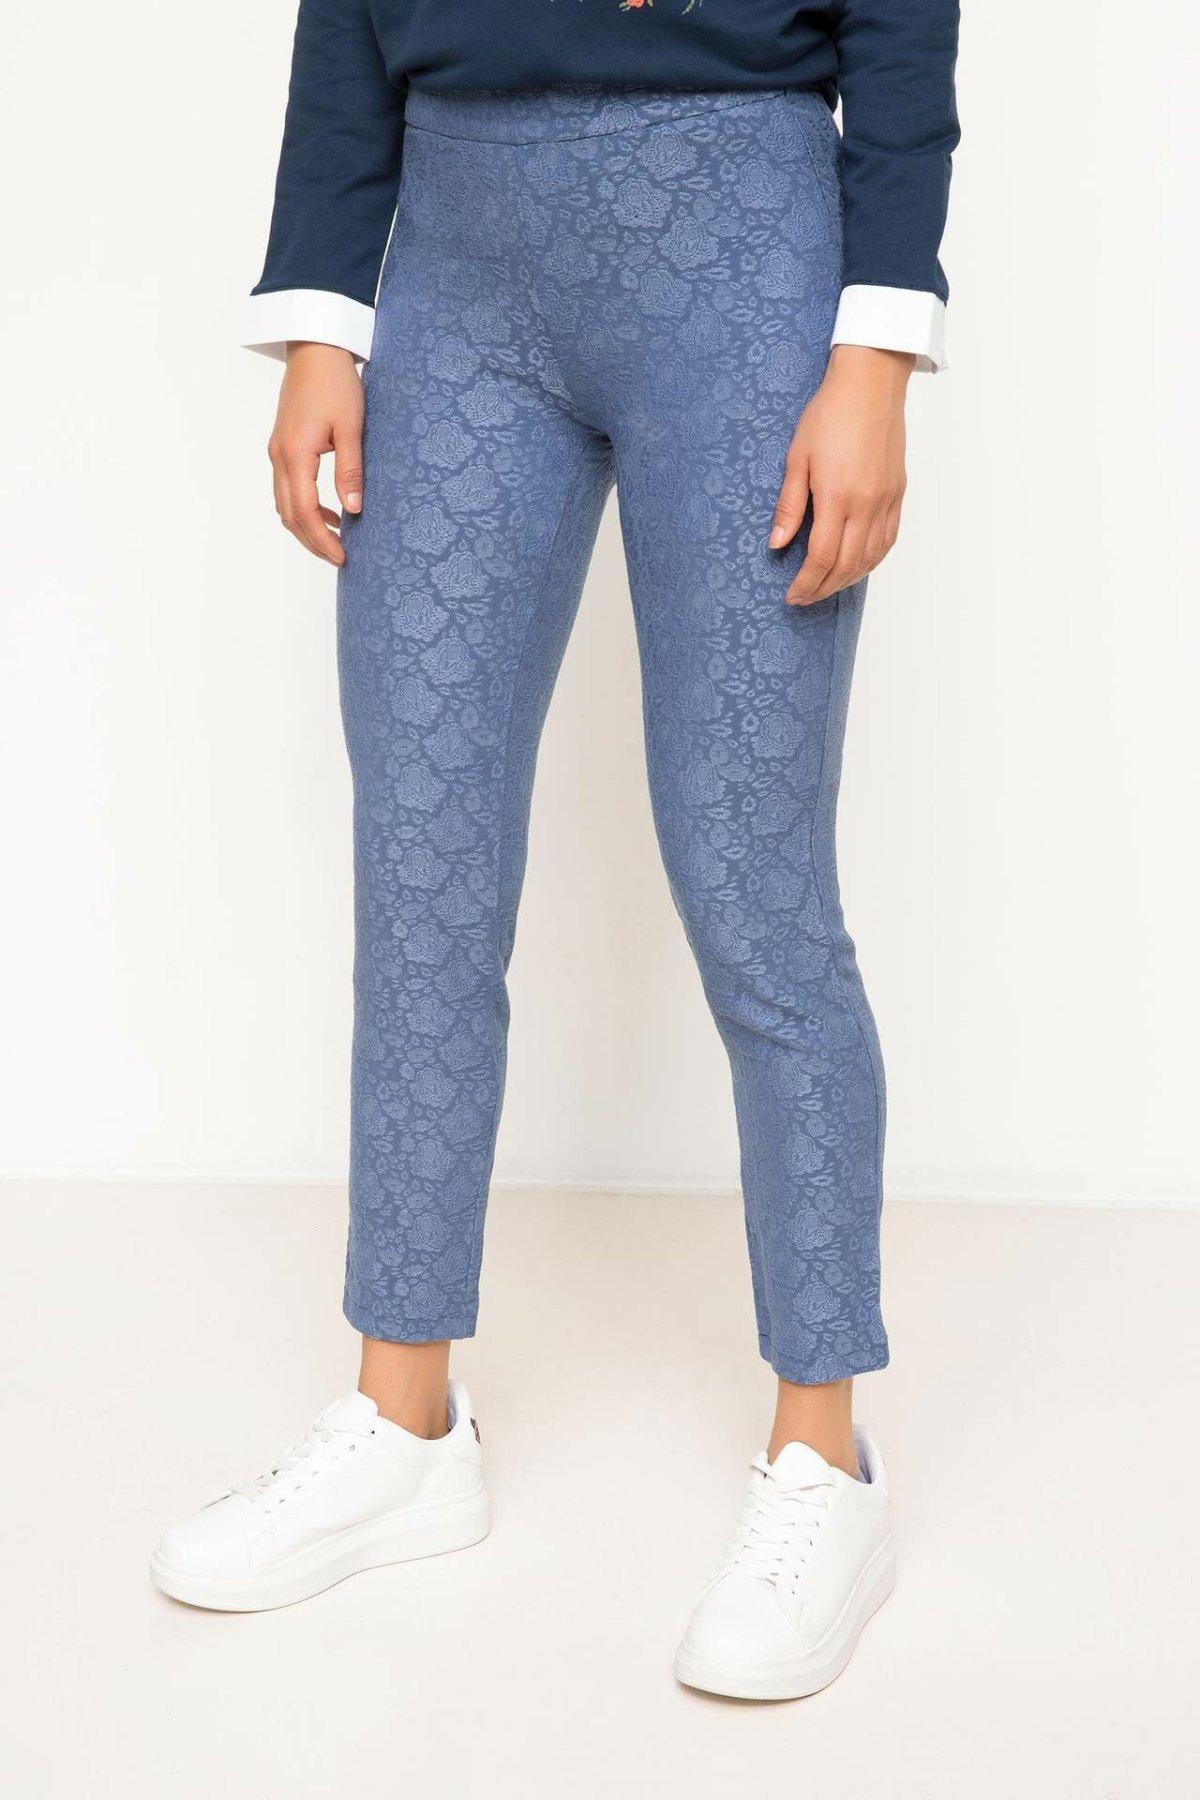 DeFacto Women Fashion High Waist Casual Women's Skinny Plaid Slim Trousers Ladies Leggings Leisure Crop Pants - H4296AZ17AU